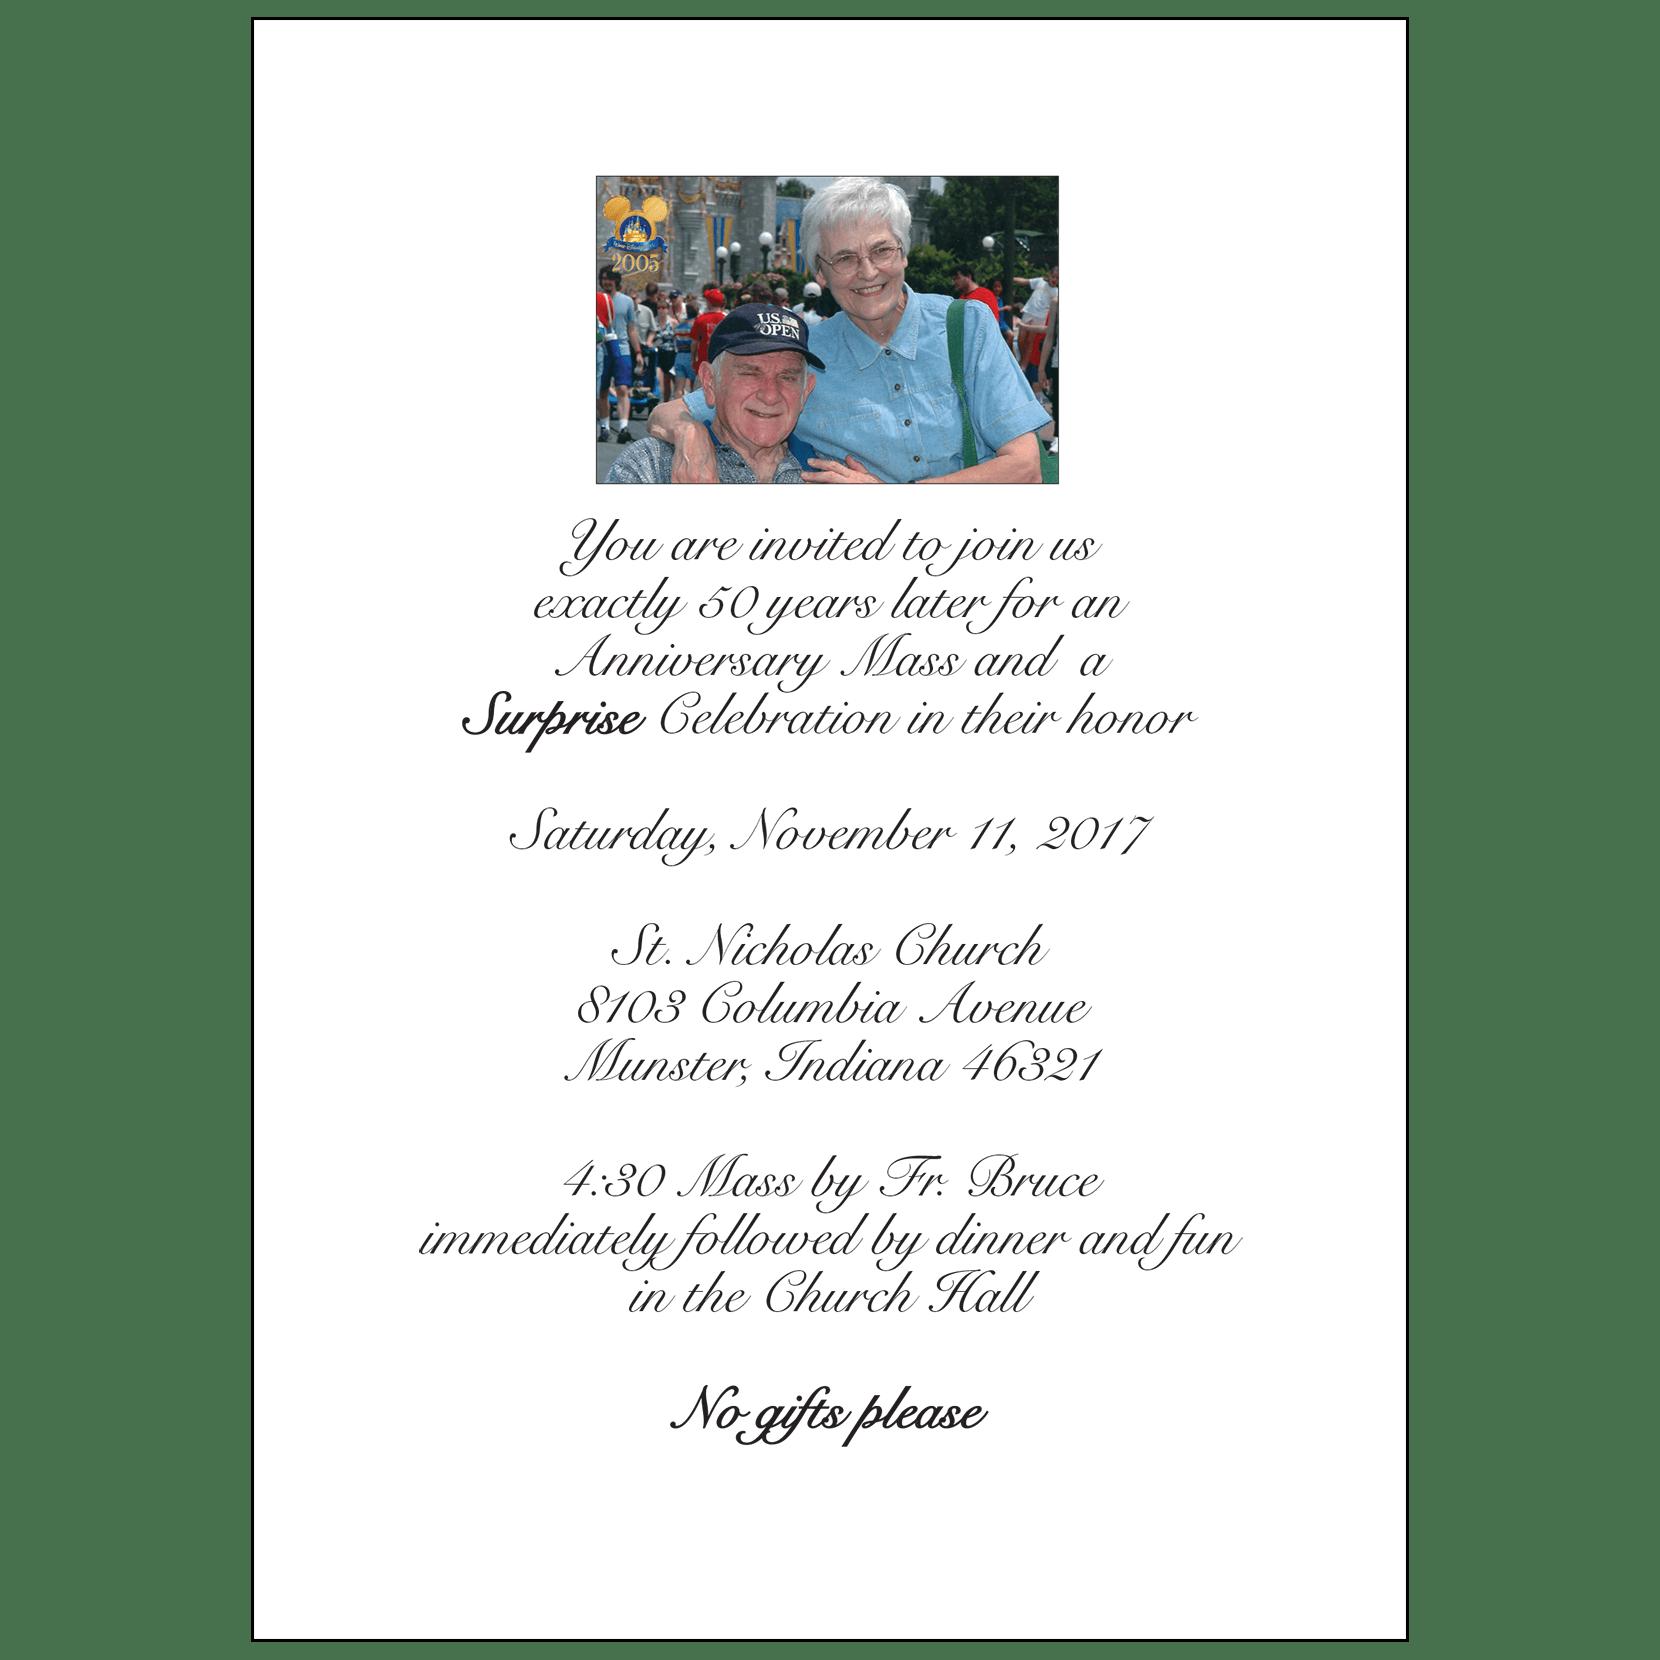 50th Wedding Anniversary Party Invitation, Style 1O – IPV Studio